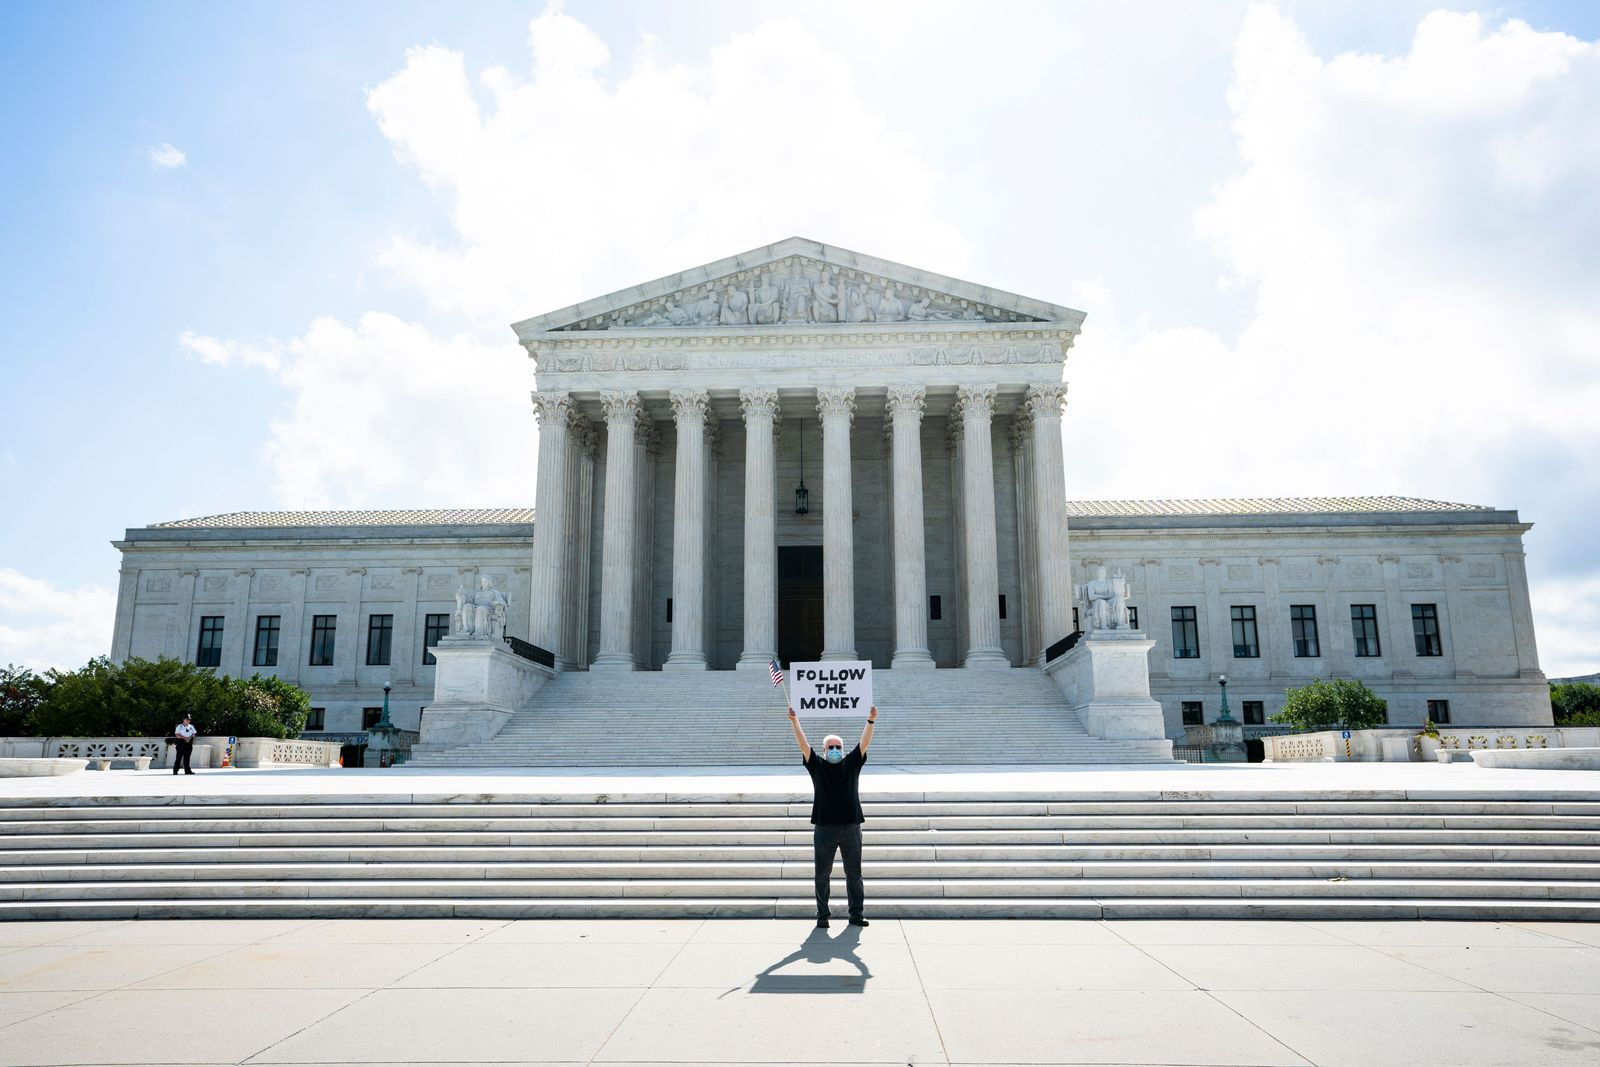 Supreme Court to rule on Trump tax returns, Washington, USA - 09 Jul 2020